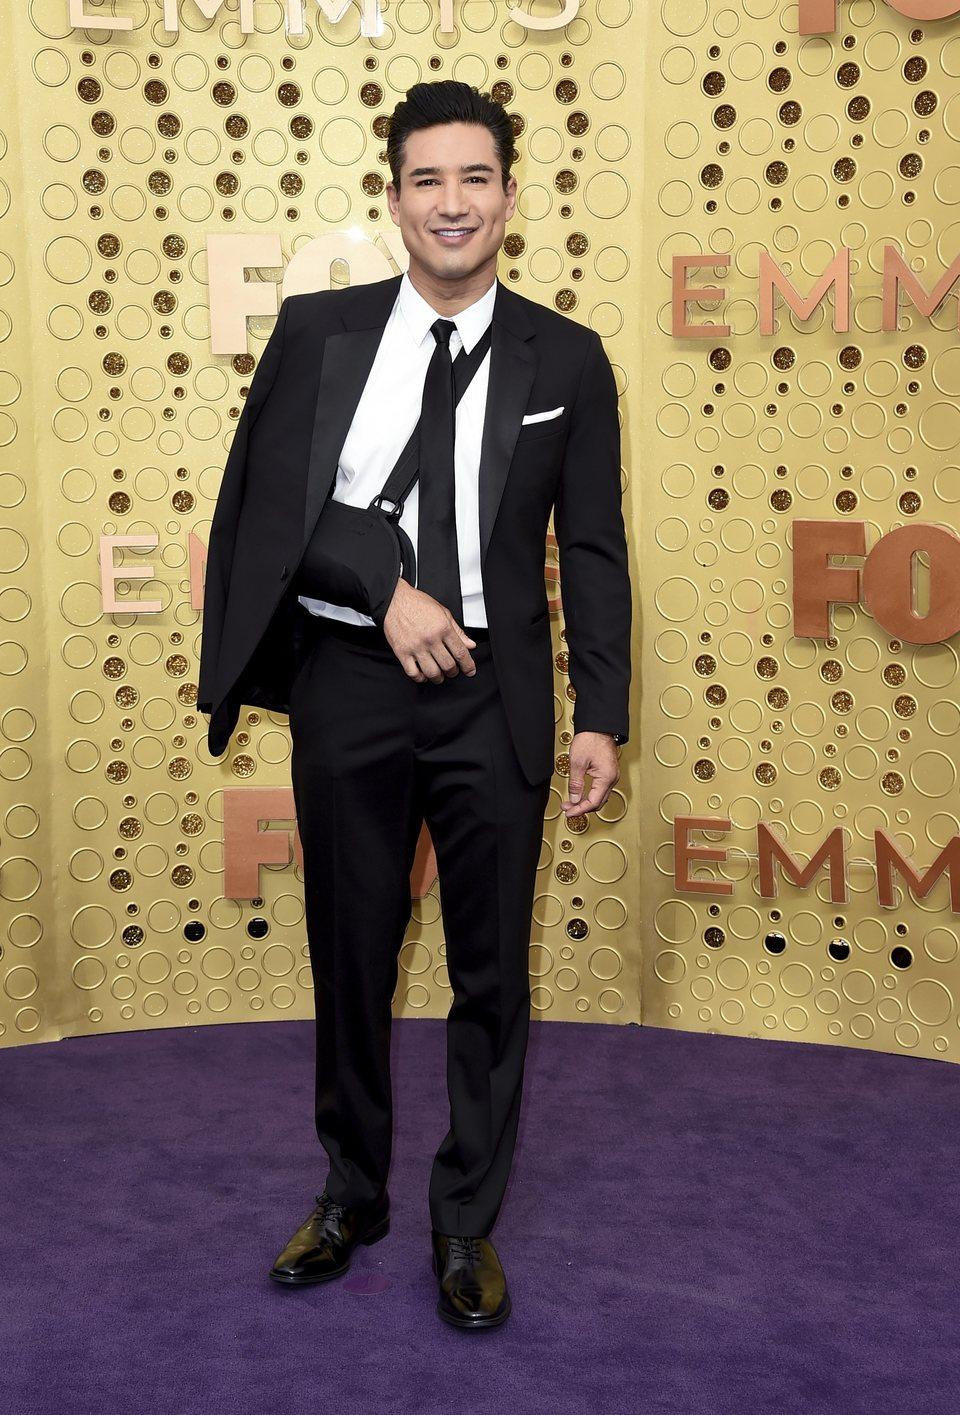 Mario Lopez arrives at the 71st Primetime Emmy Awards